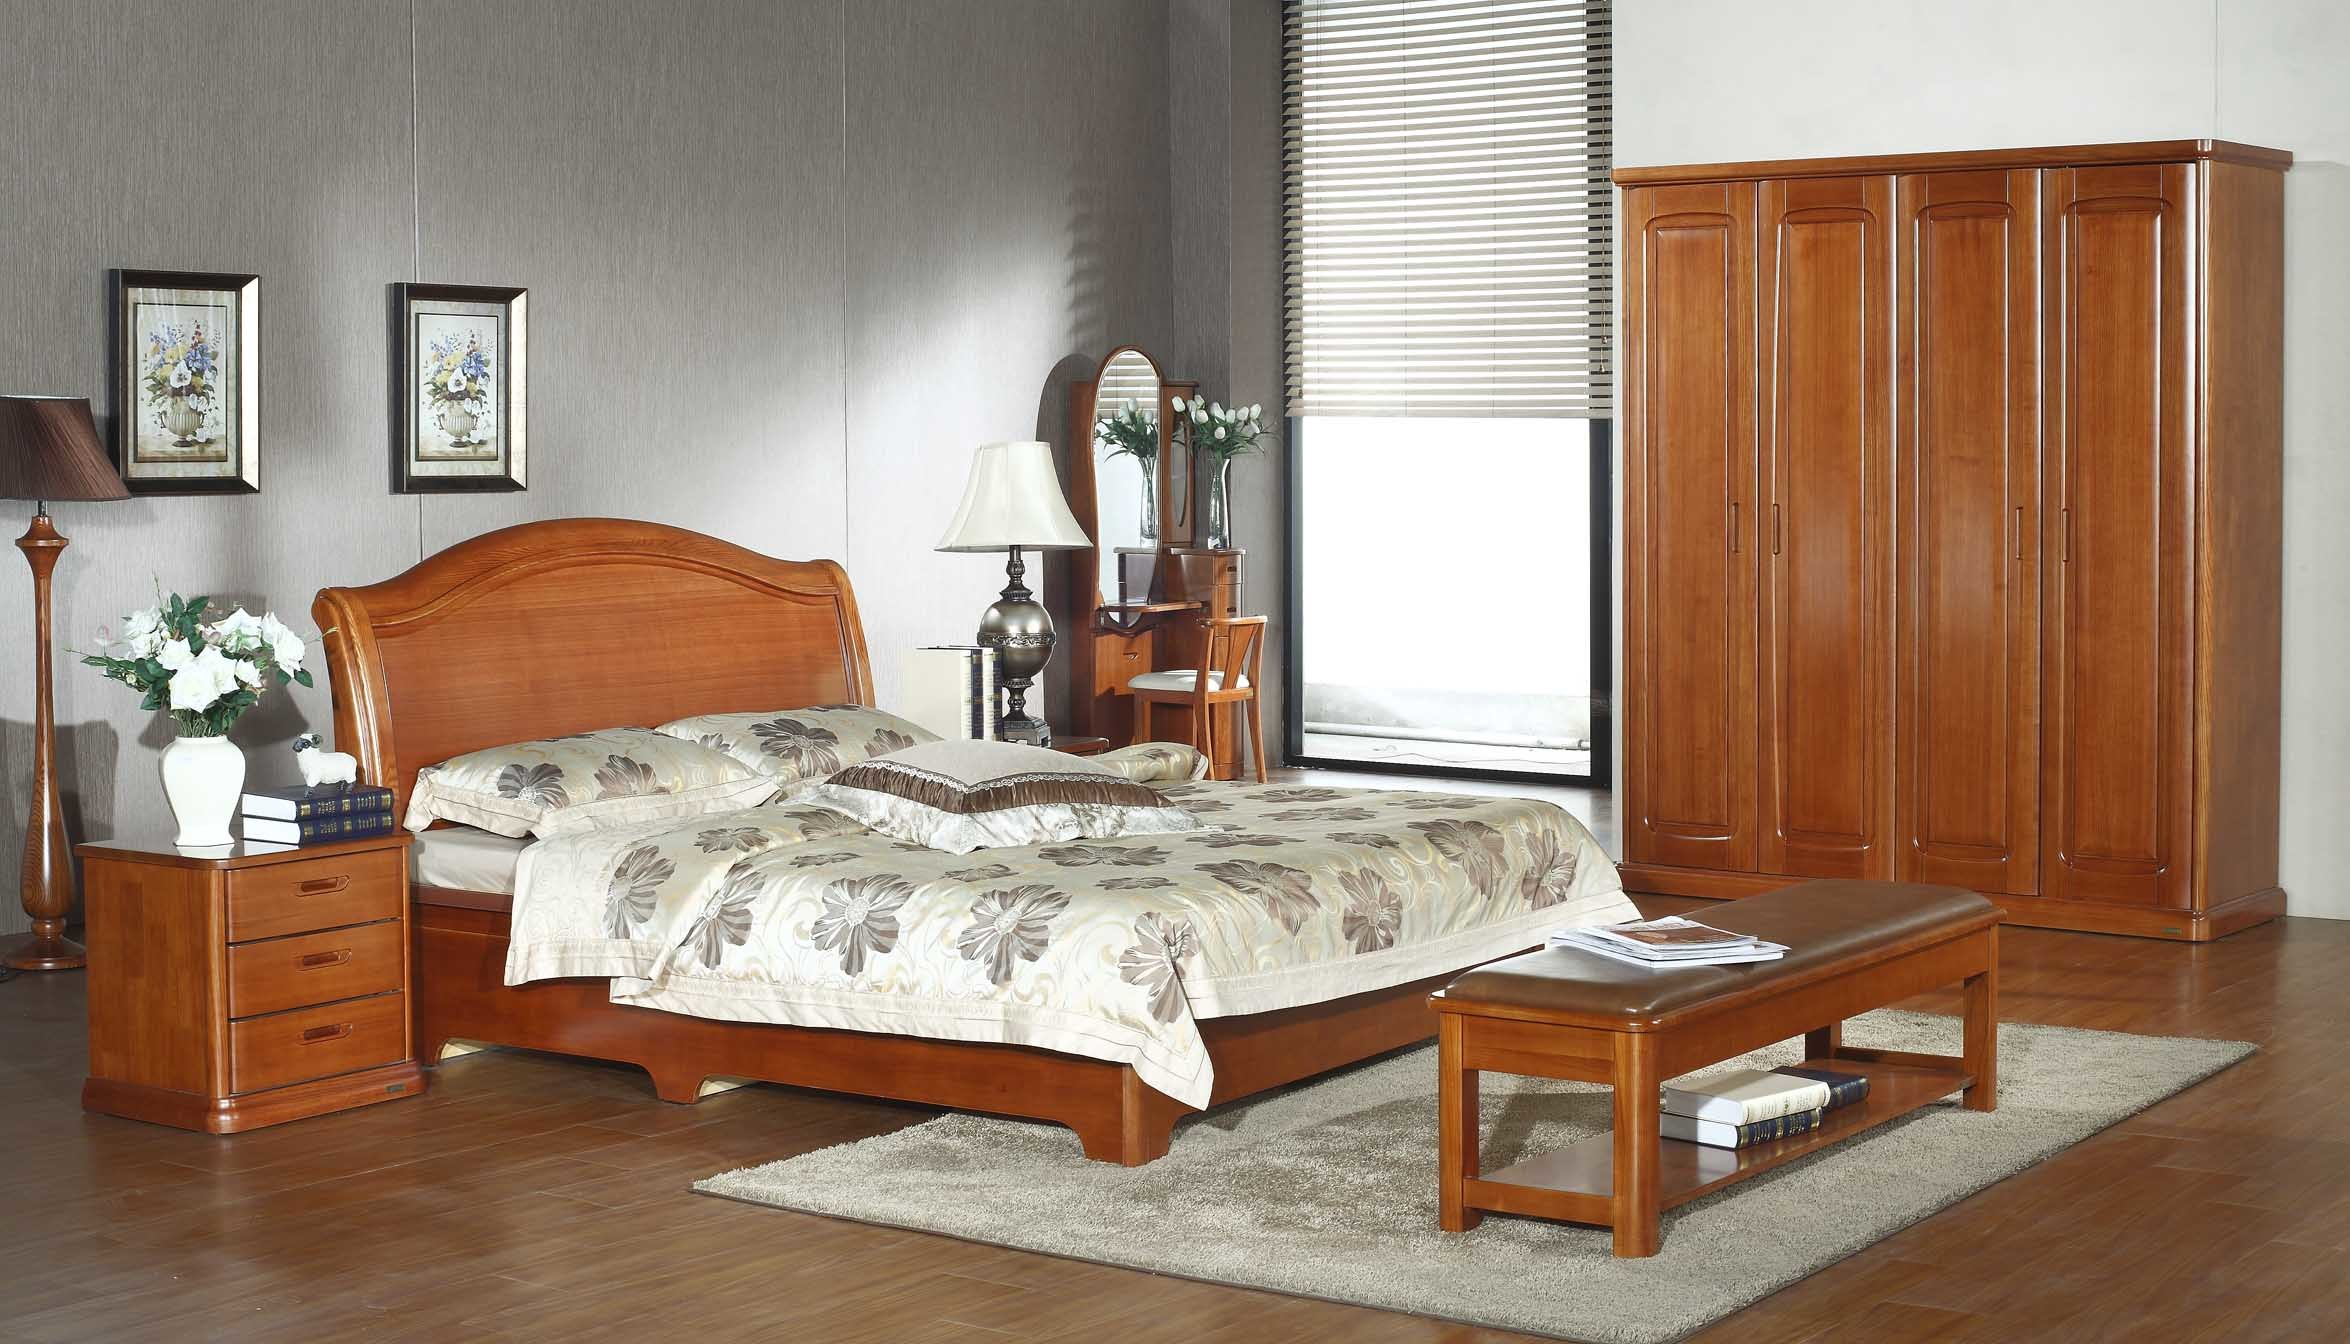 Meubles de chambre coucher r gl s sd02 meubles de - Meubles chambre a coucher ...